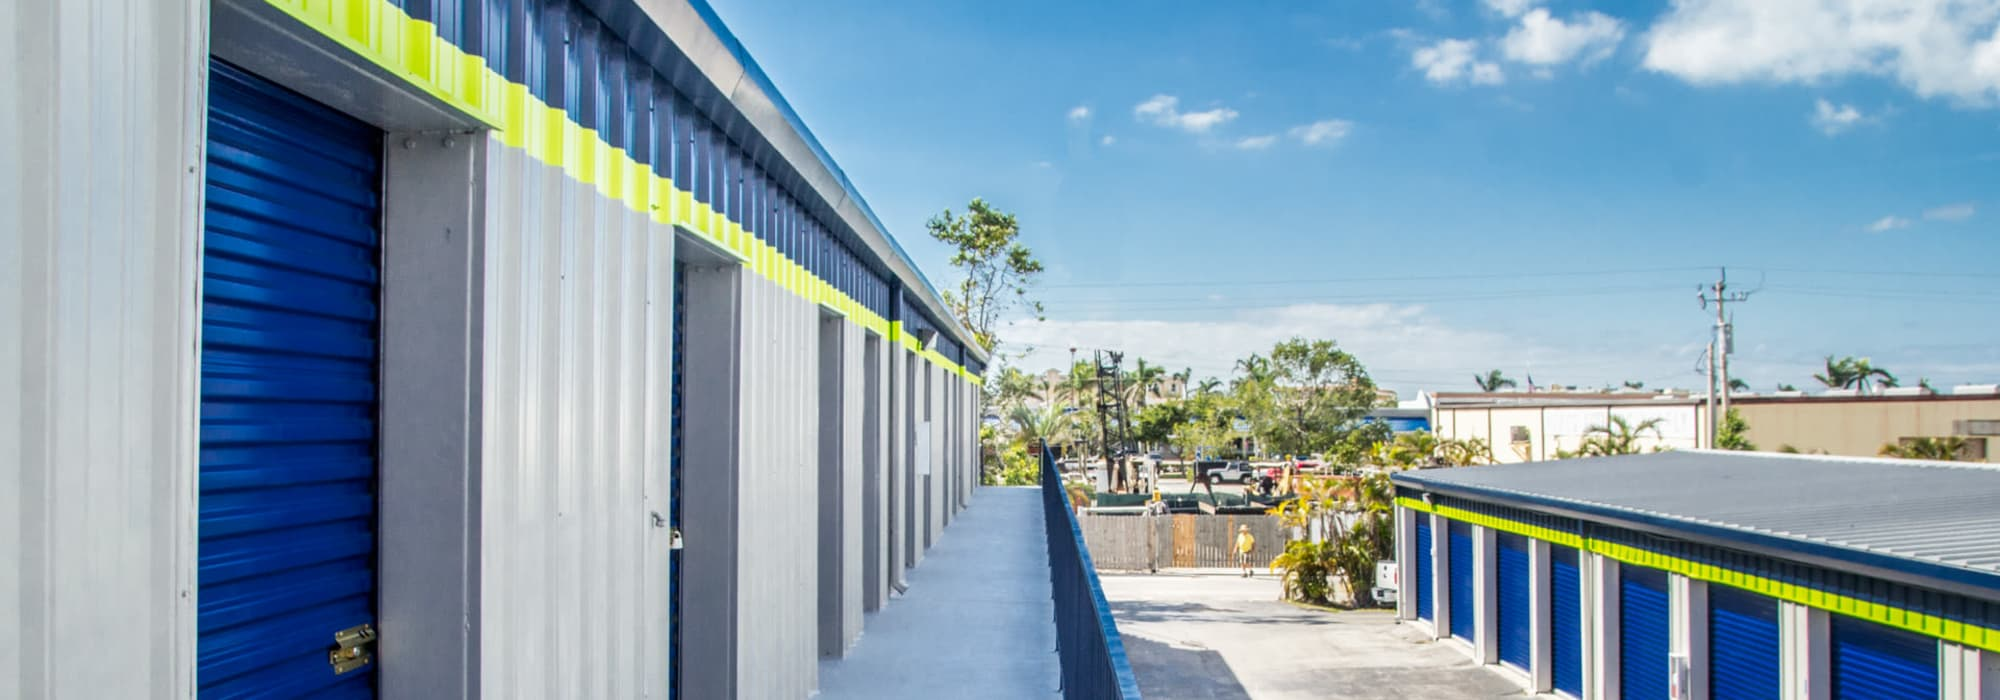 Prime Storage in Marco Island, FL